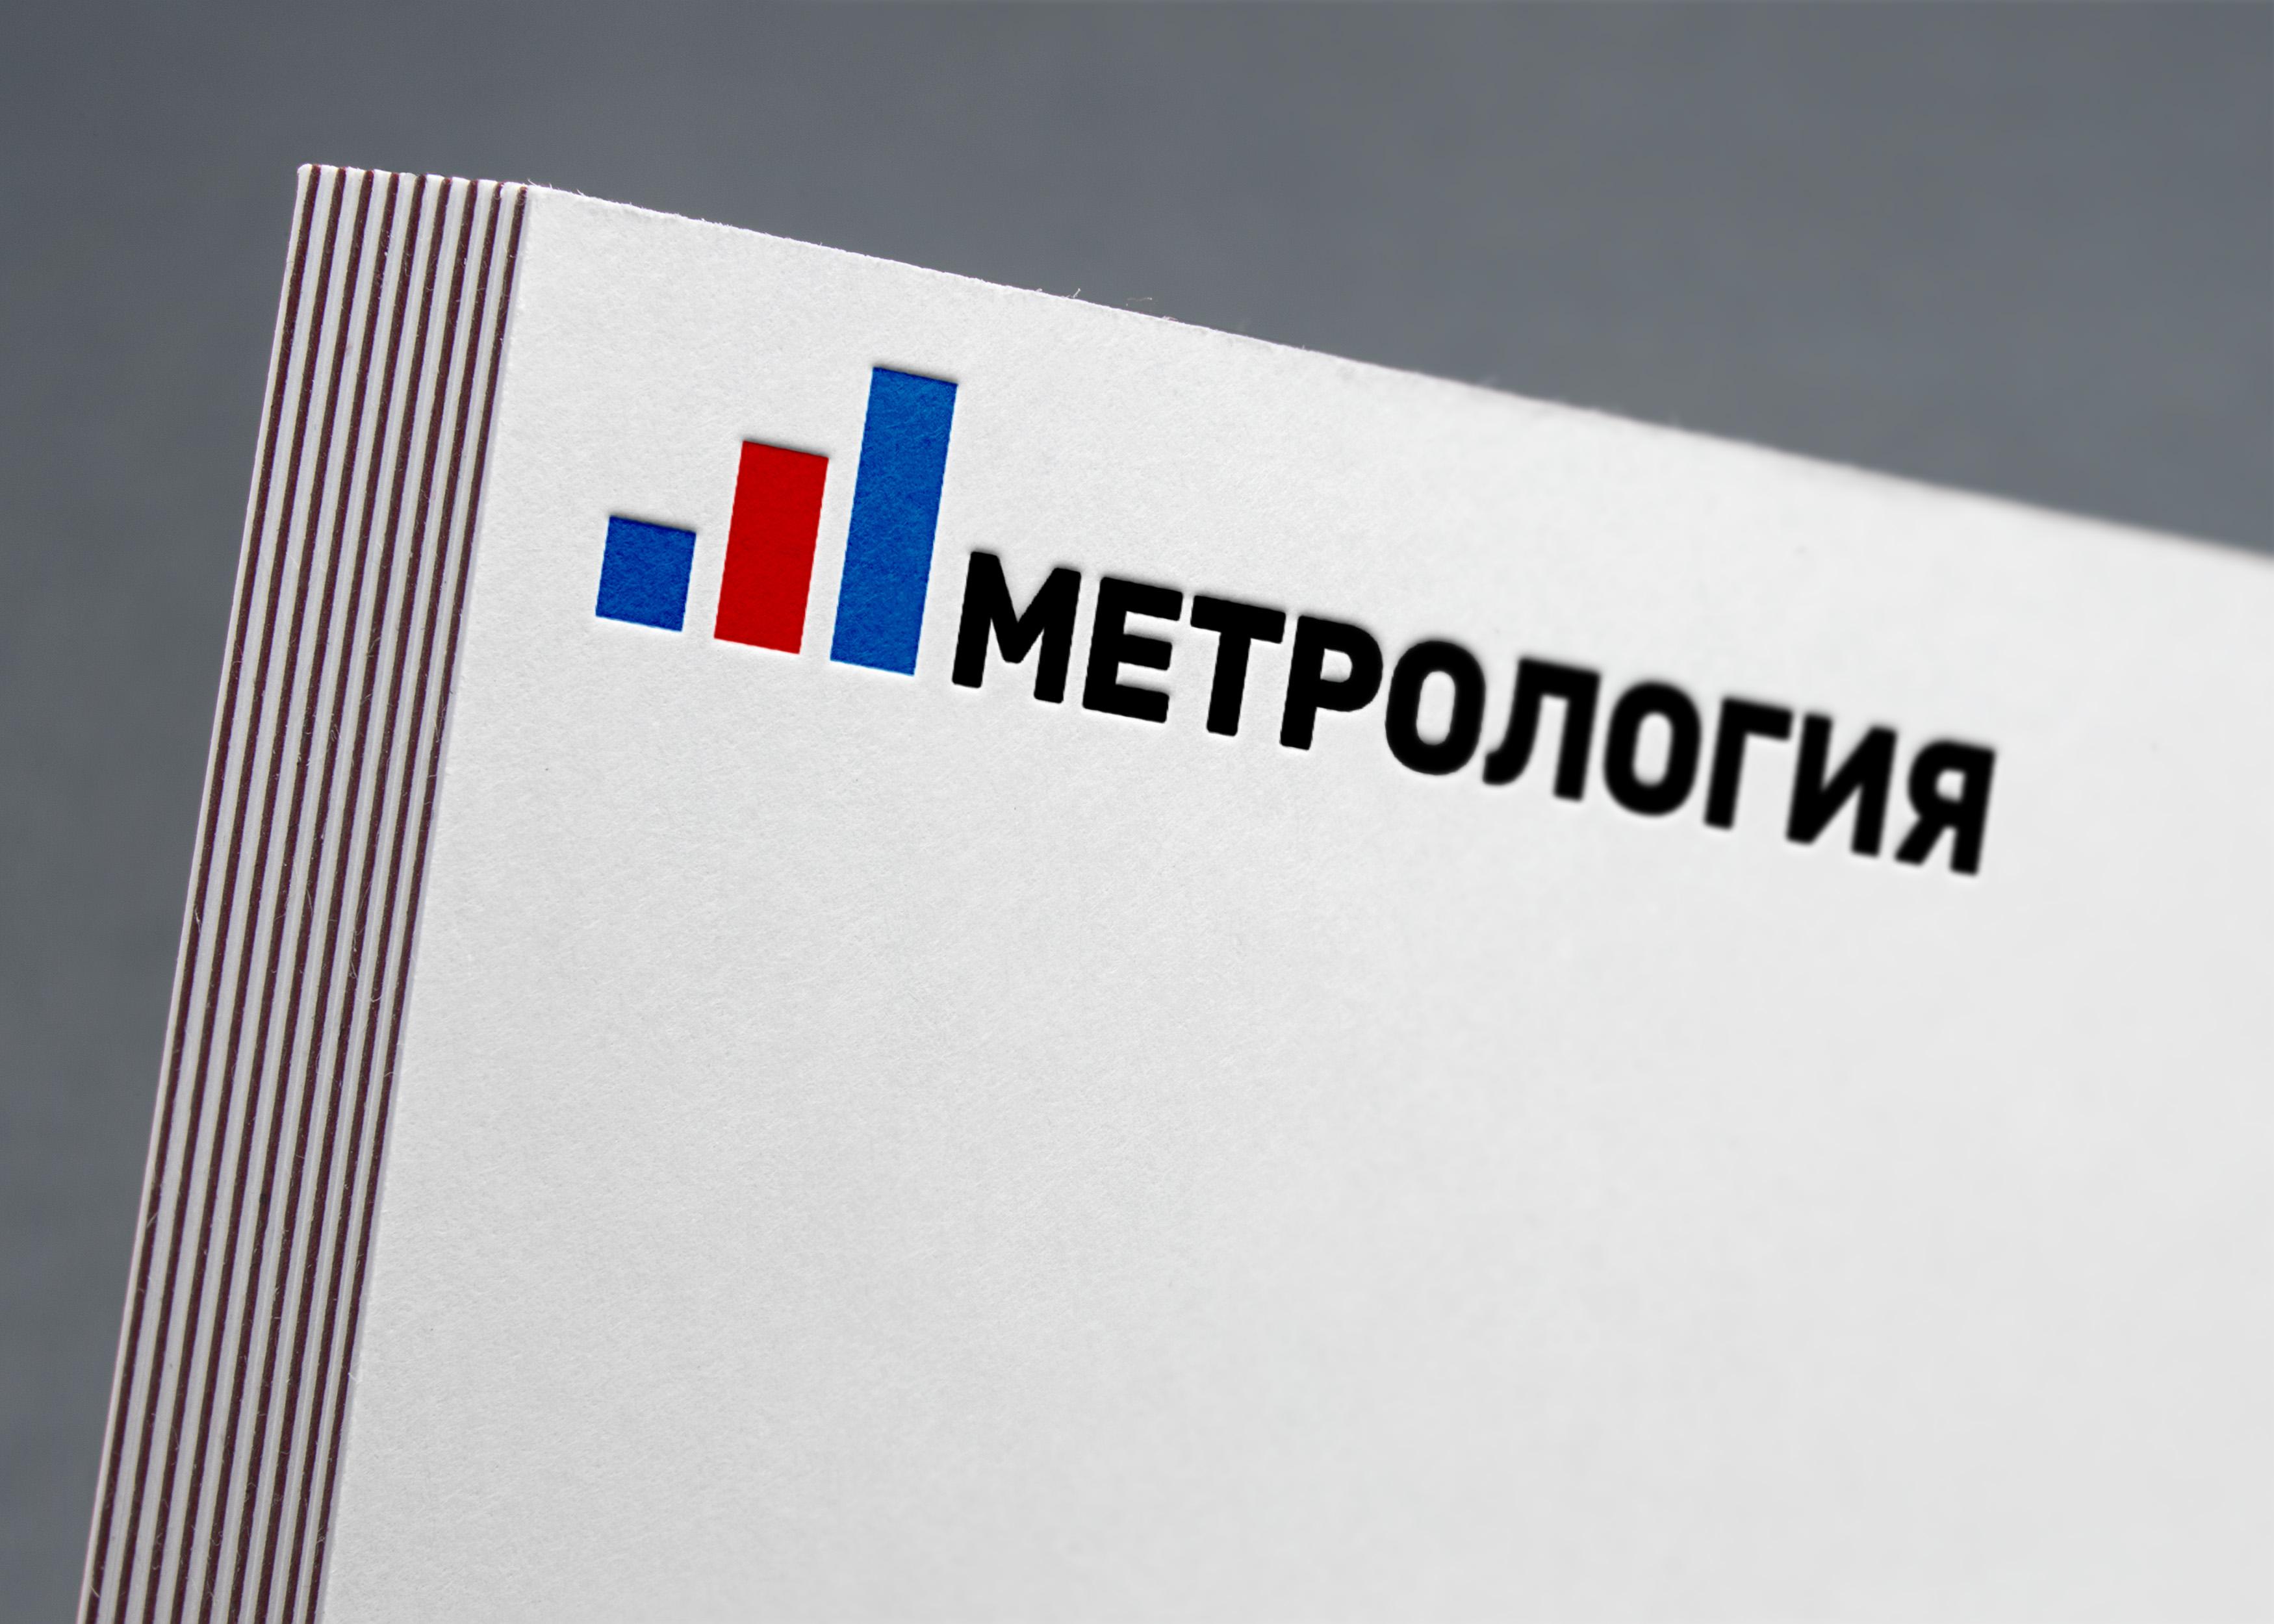 Разработать логотип, визитку, фирменный бланк. фото f_81058f4e16bc6988.jpg